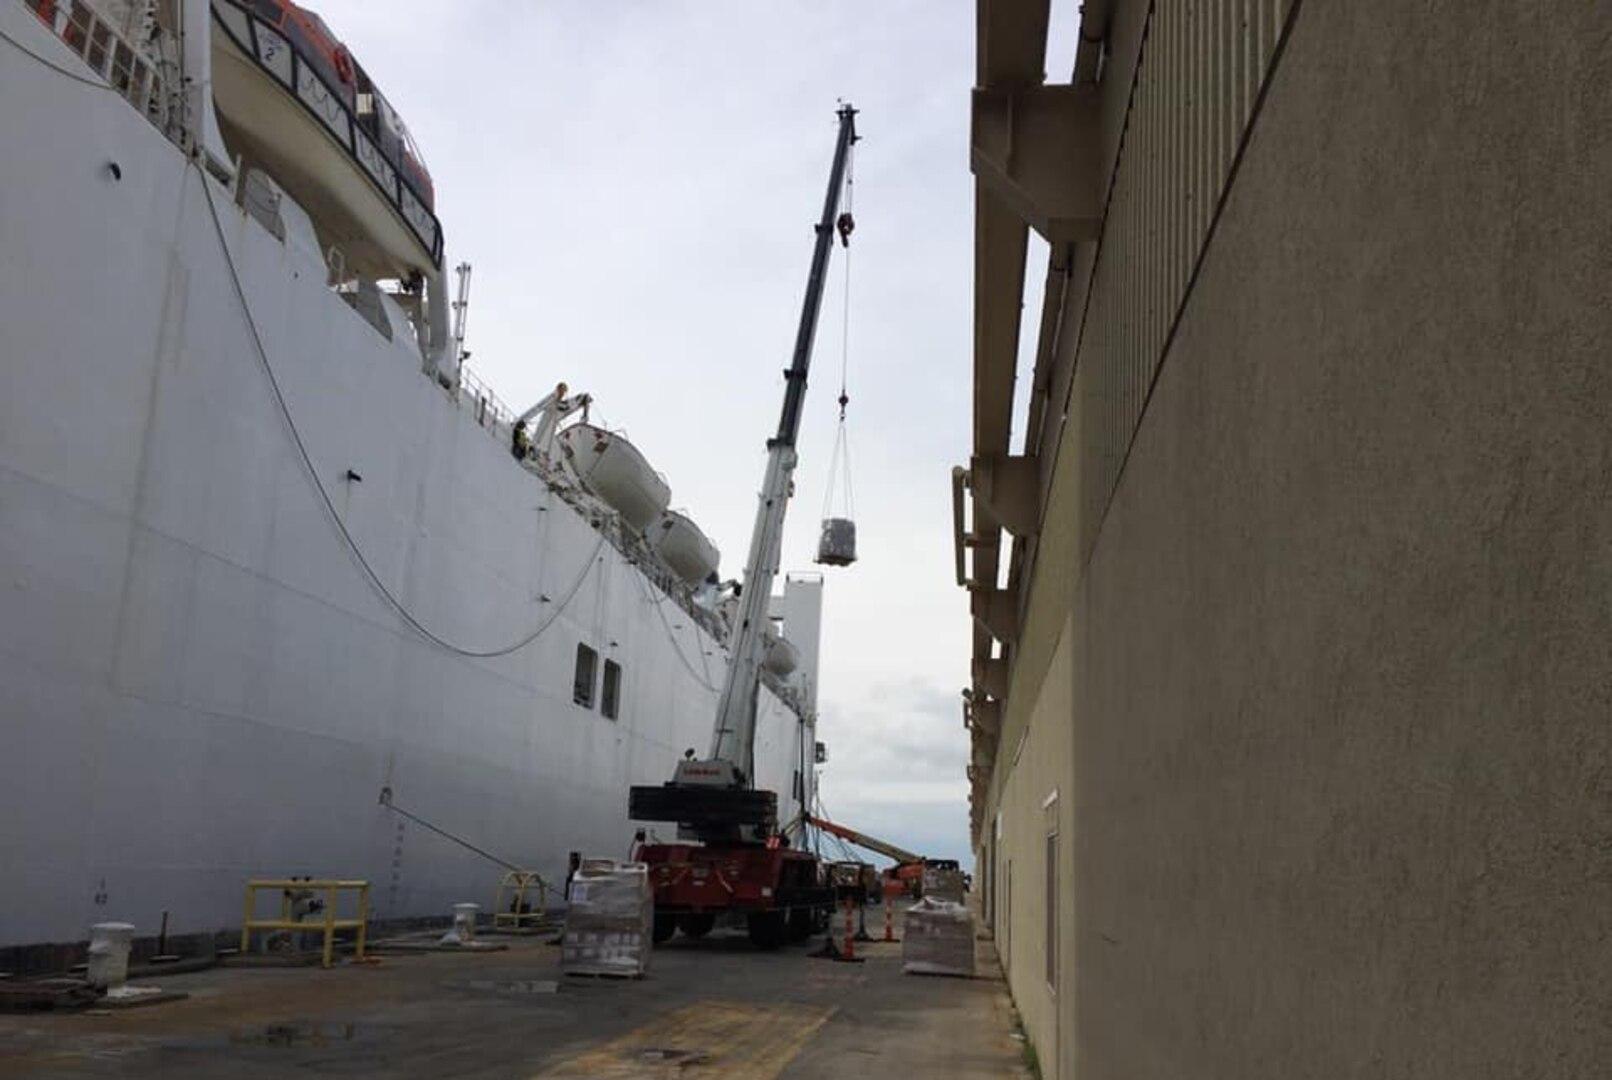 DLA Distribution Norfolk provides mission support to USNS Comfort bound for NYC